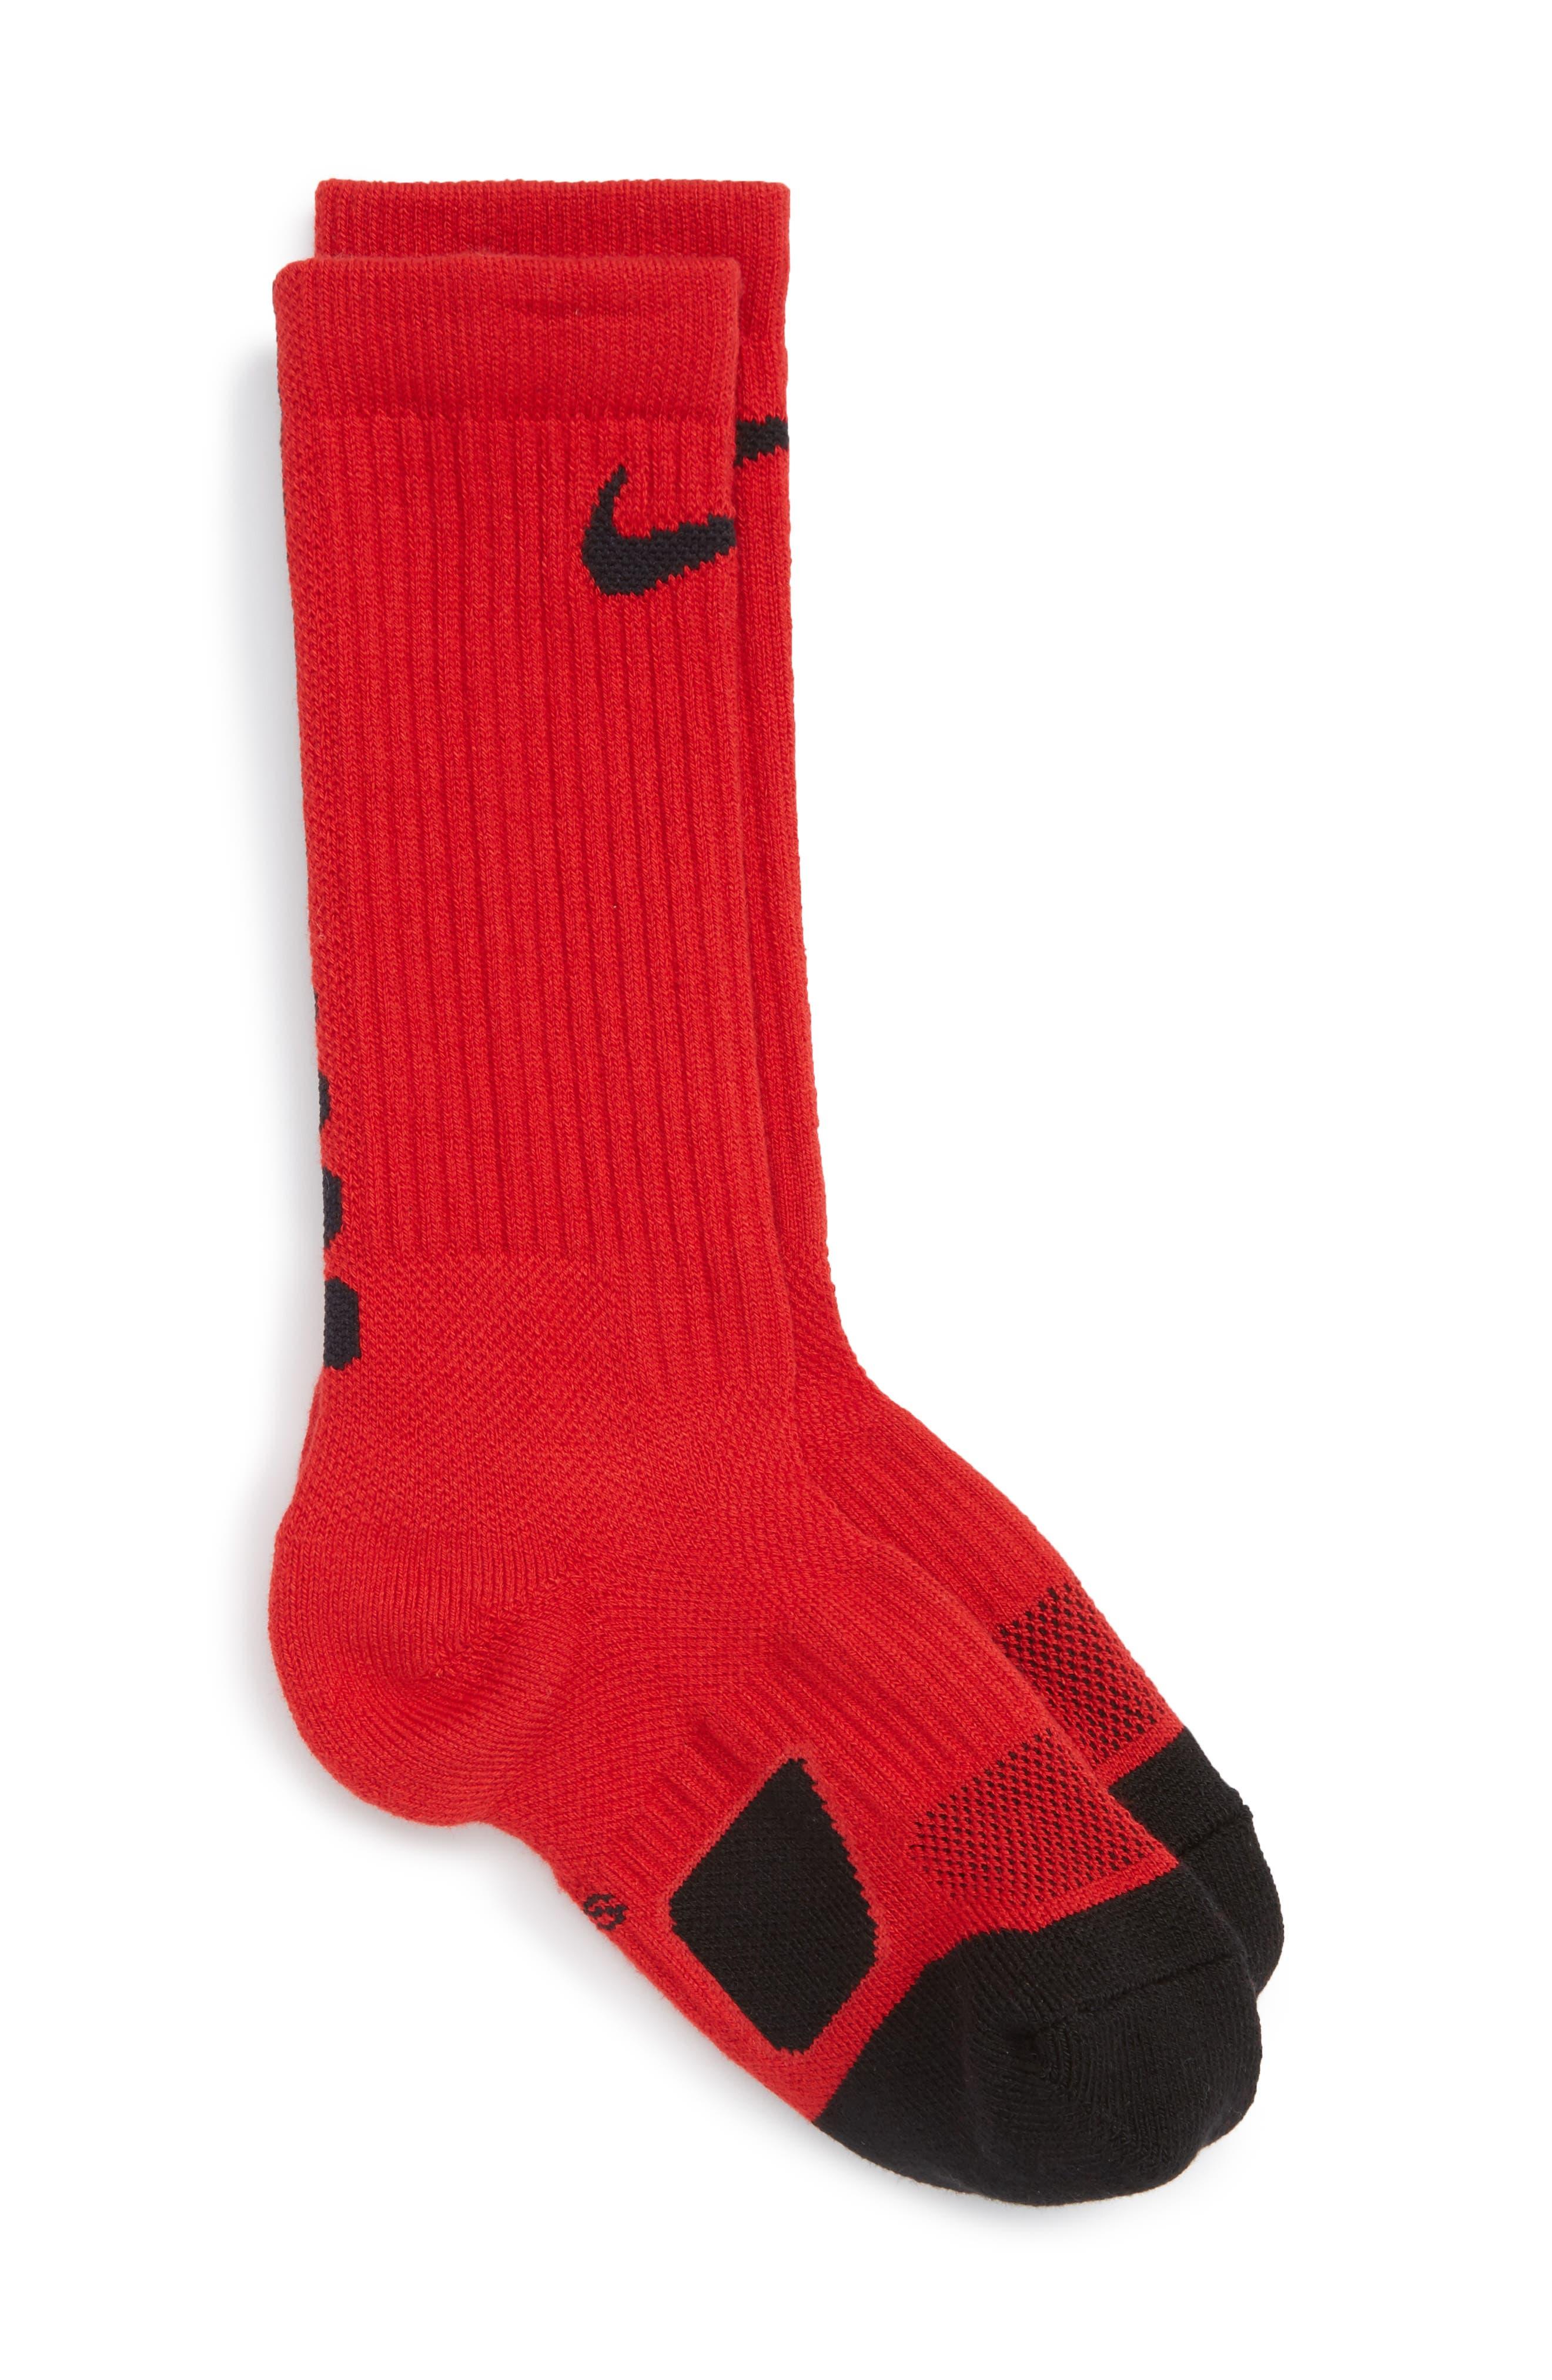 Elite Versatility Crew Socks,                         Main,                         color, Red/ Black